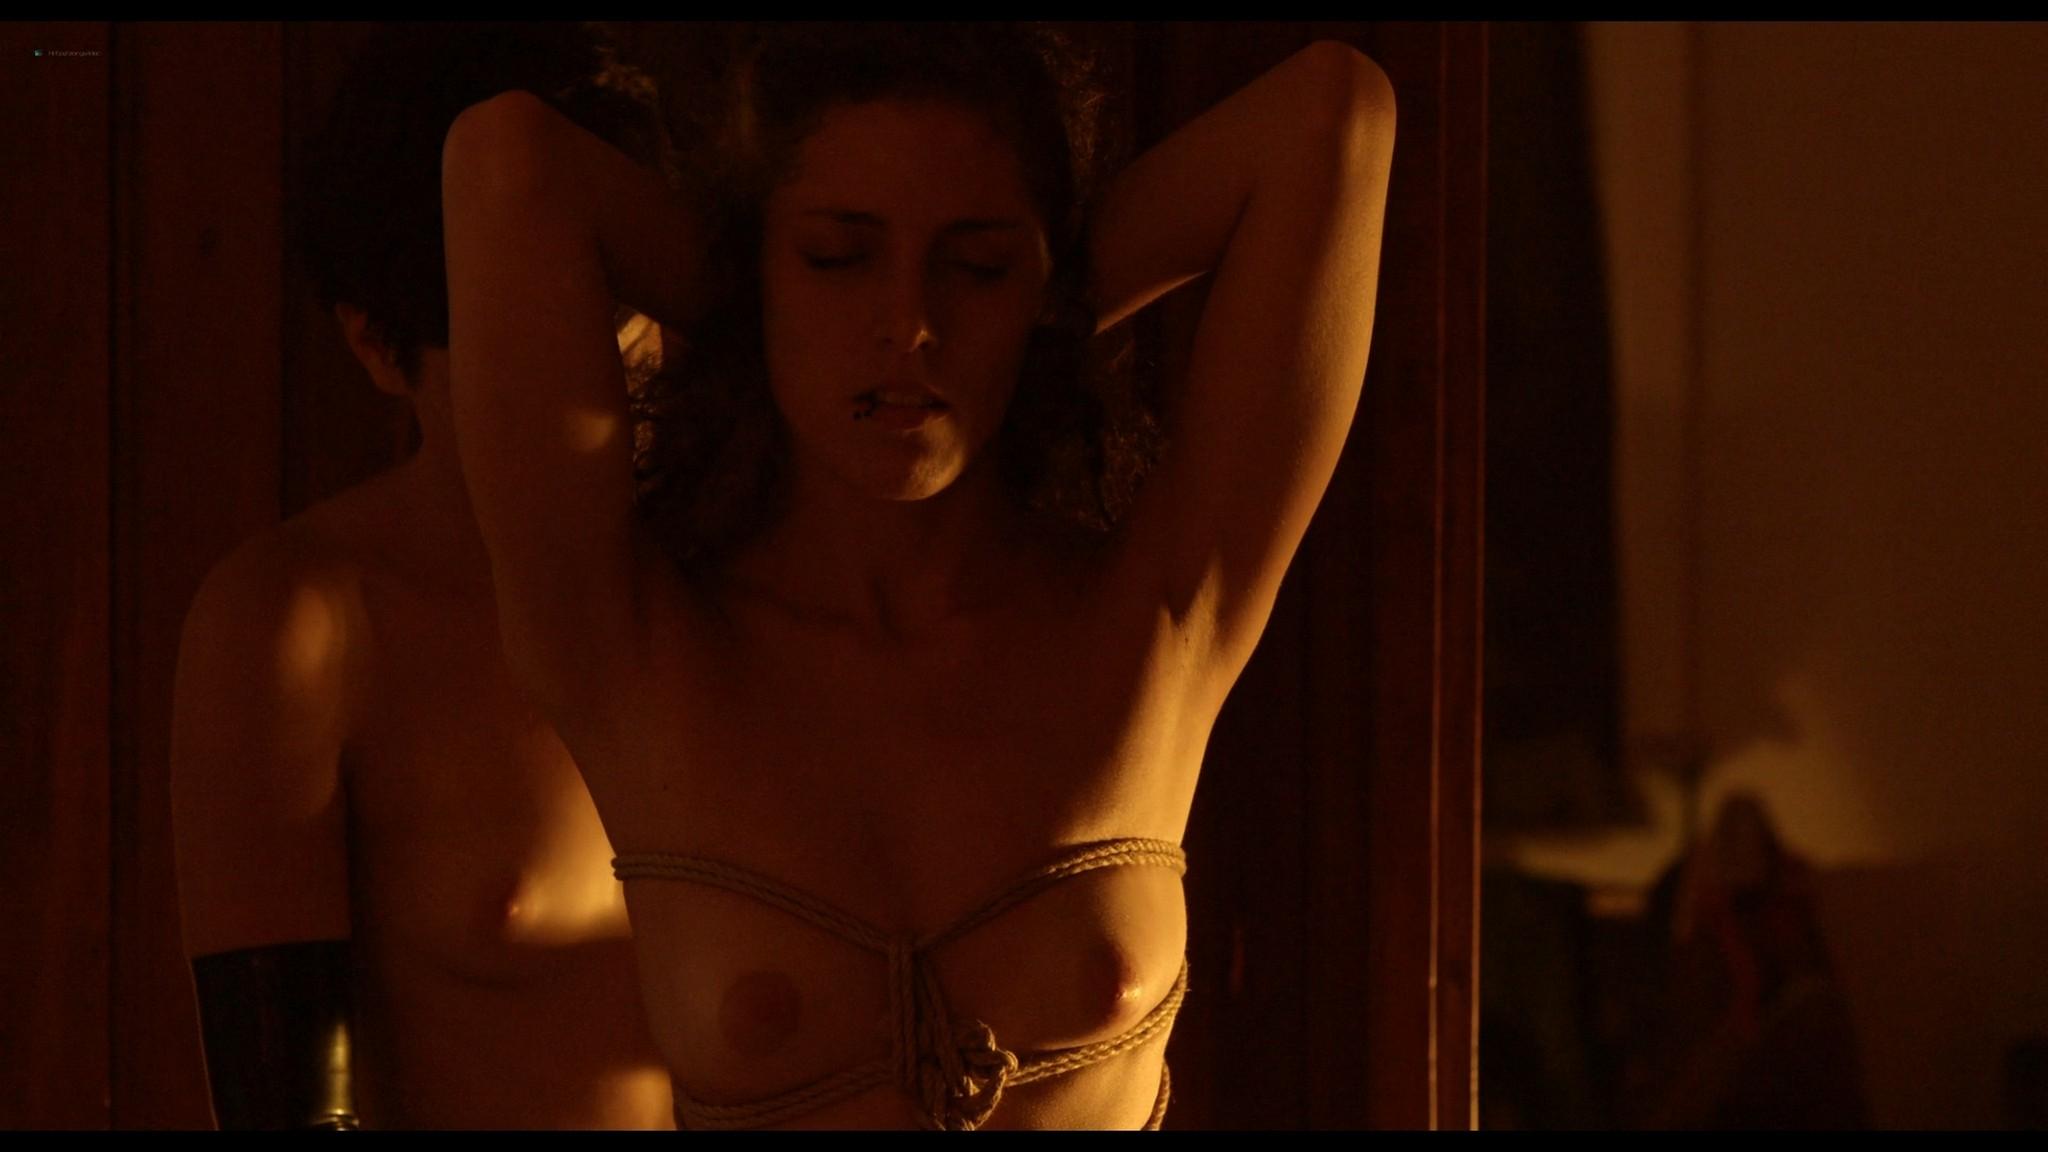 Sofia Gala Castiglione nude explicit Erica Rivas and others nude explicit lesbian sex The Daughters of Fire 2018 1080p Web 13